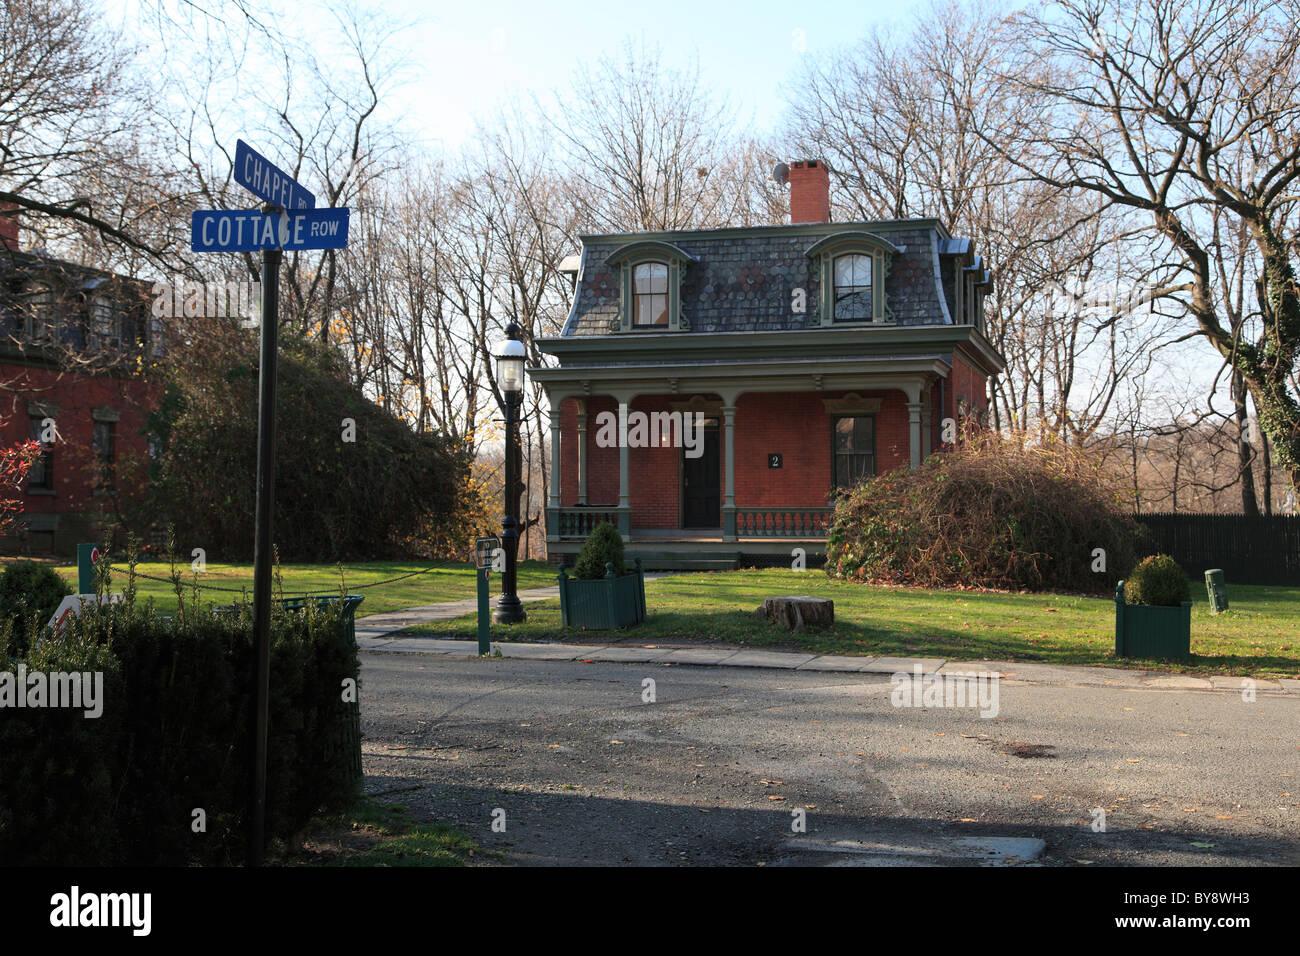 Superieur Cottage Row, Snug Harbor Cultural Center And Botanical Garden, Richmond  Terrace, Staten Island, New York City